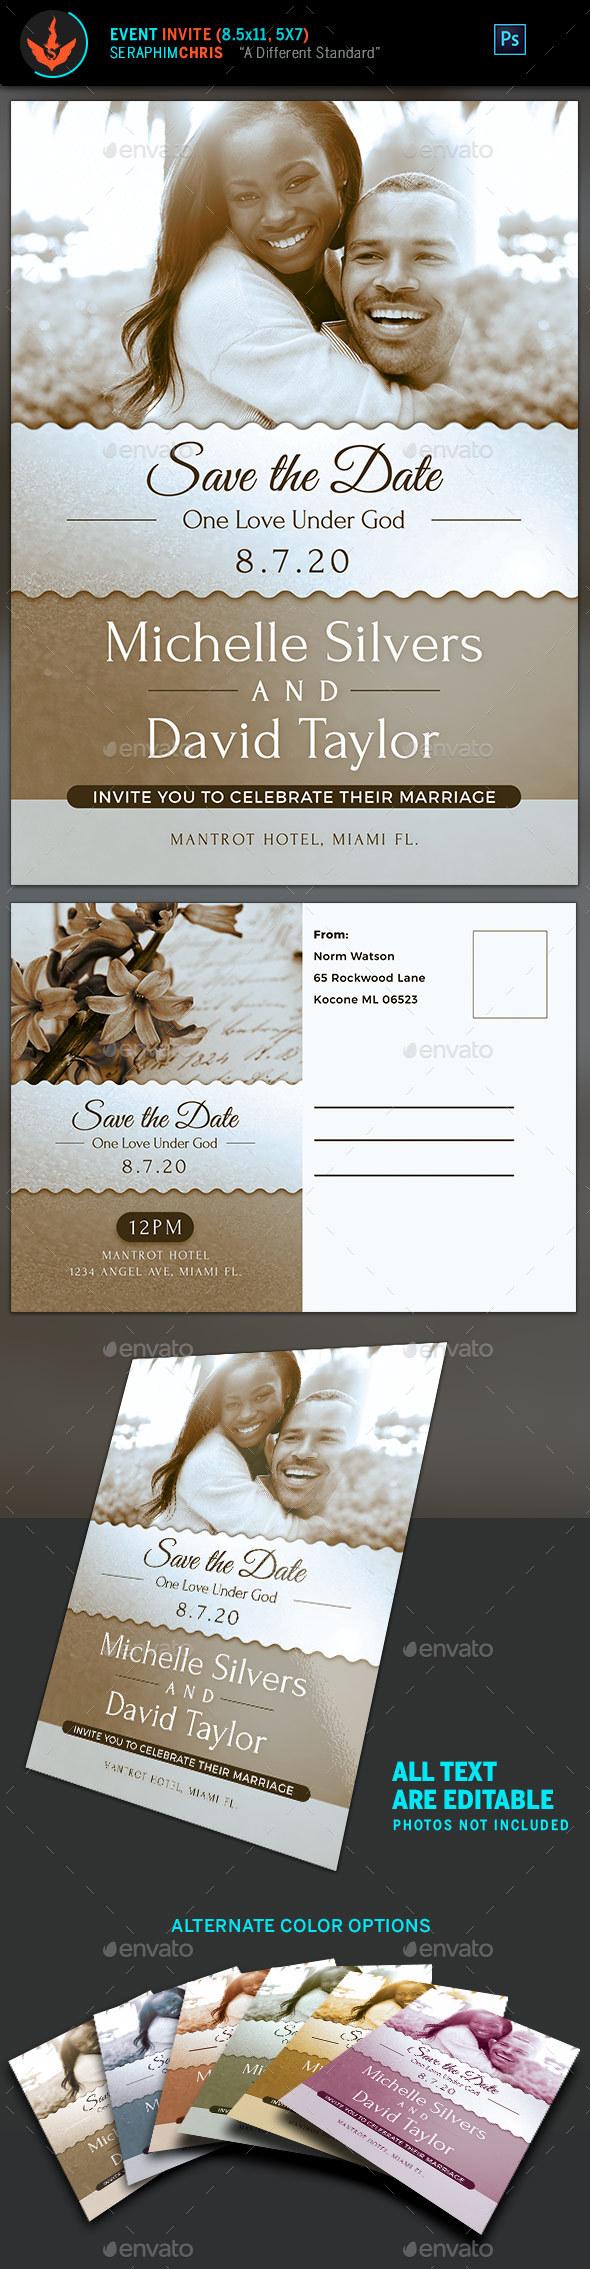 Vintage Wedding Invite Template - Weddings Cards & Invites